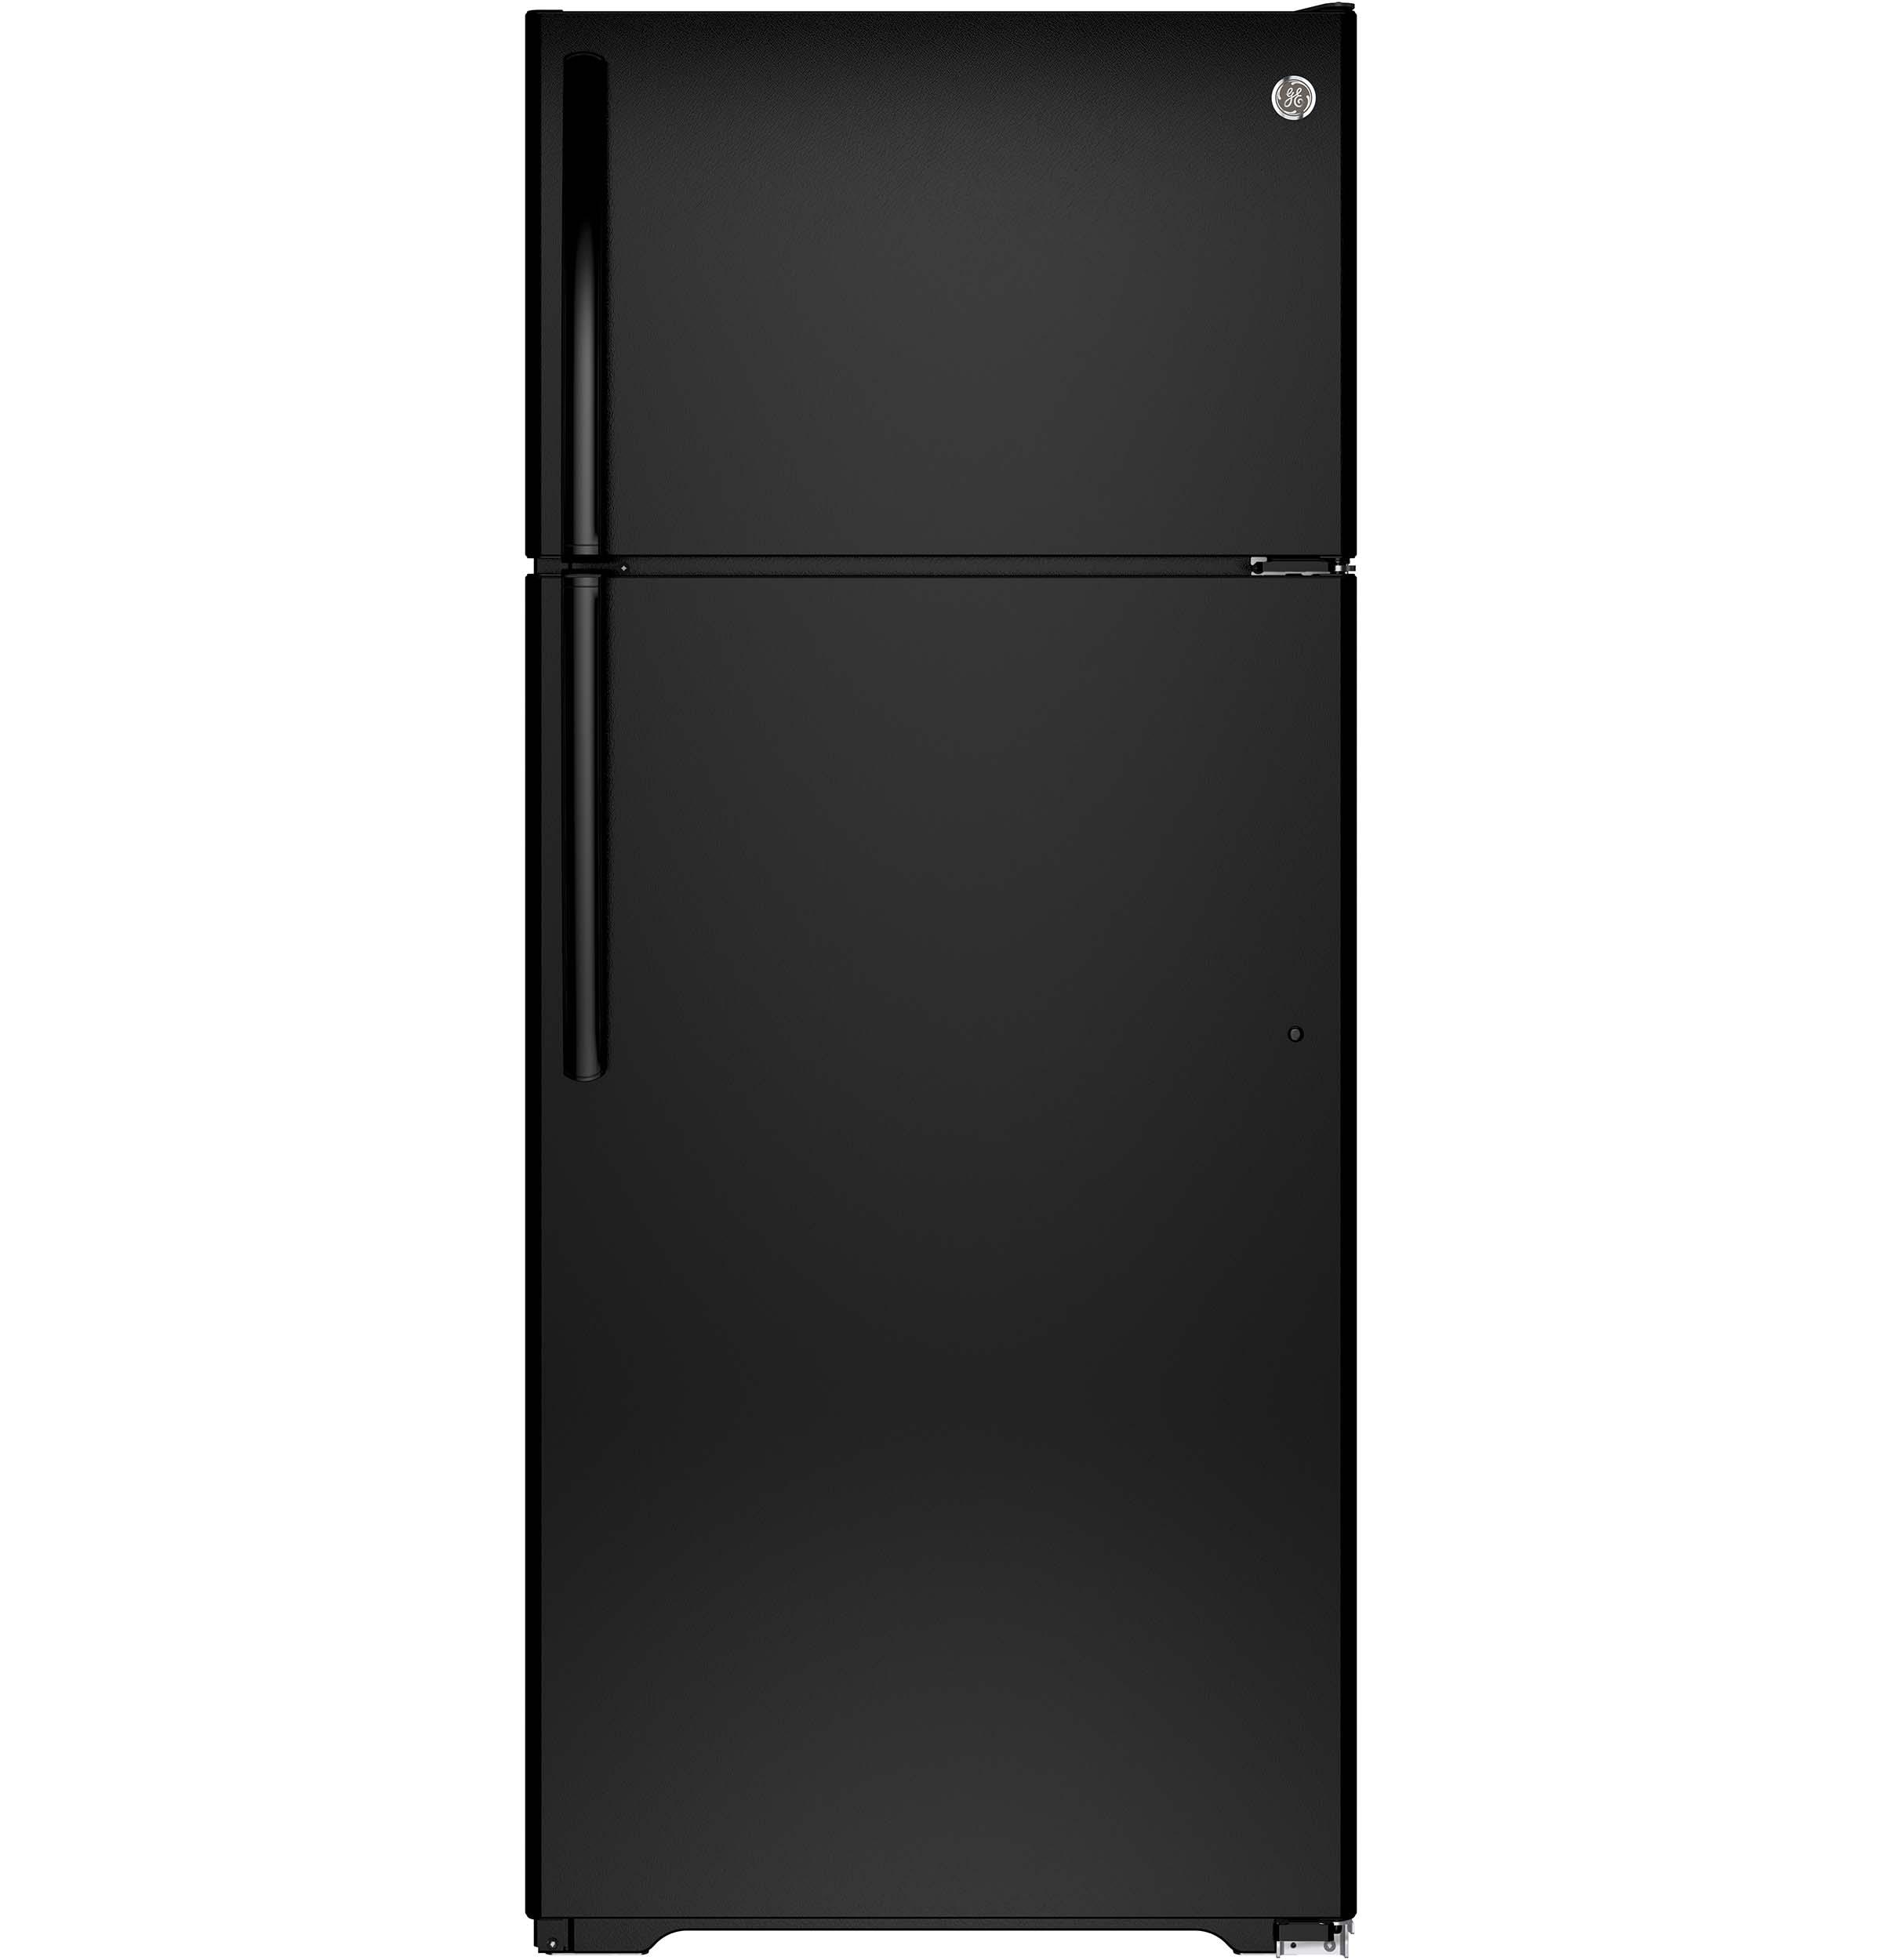 GE - GIE18GTHBB - GE® ENERGY STAR® 17.5 Cu. Ft. Top-Freezer ... Ge Gie Gshss Refrigerator Schematic Diagram on